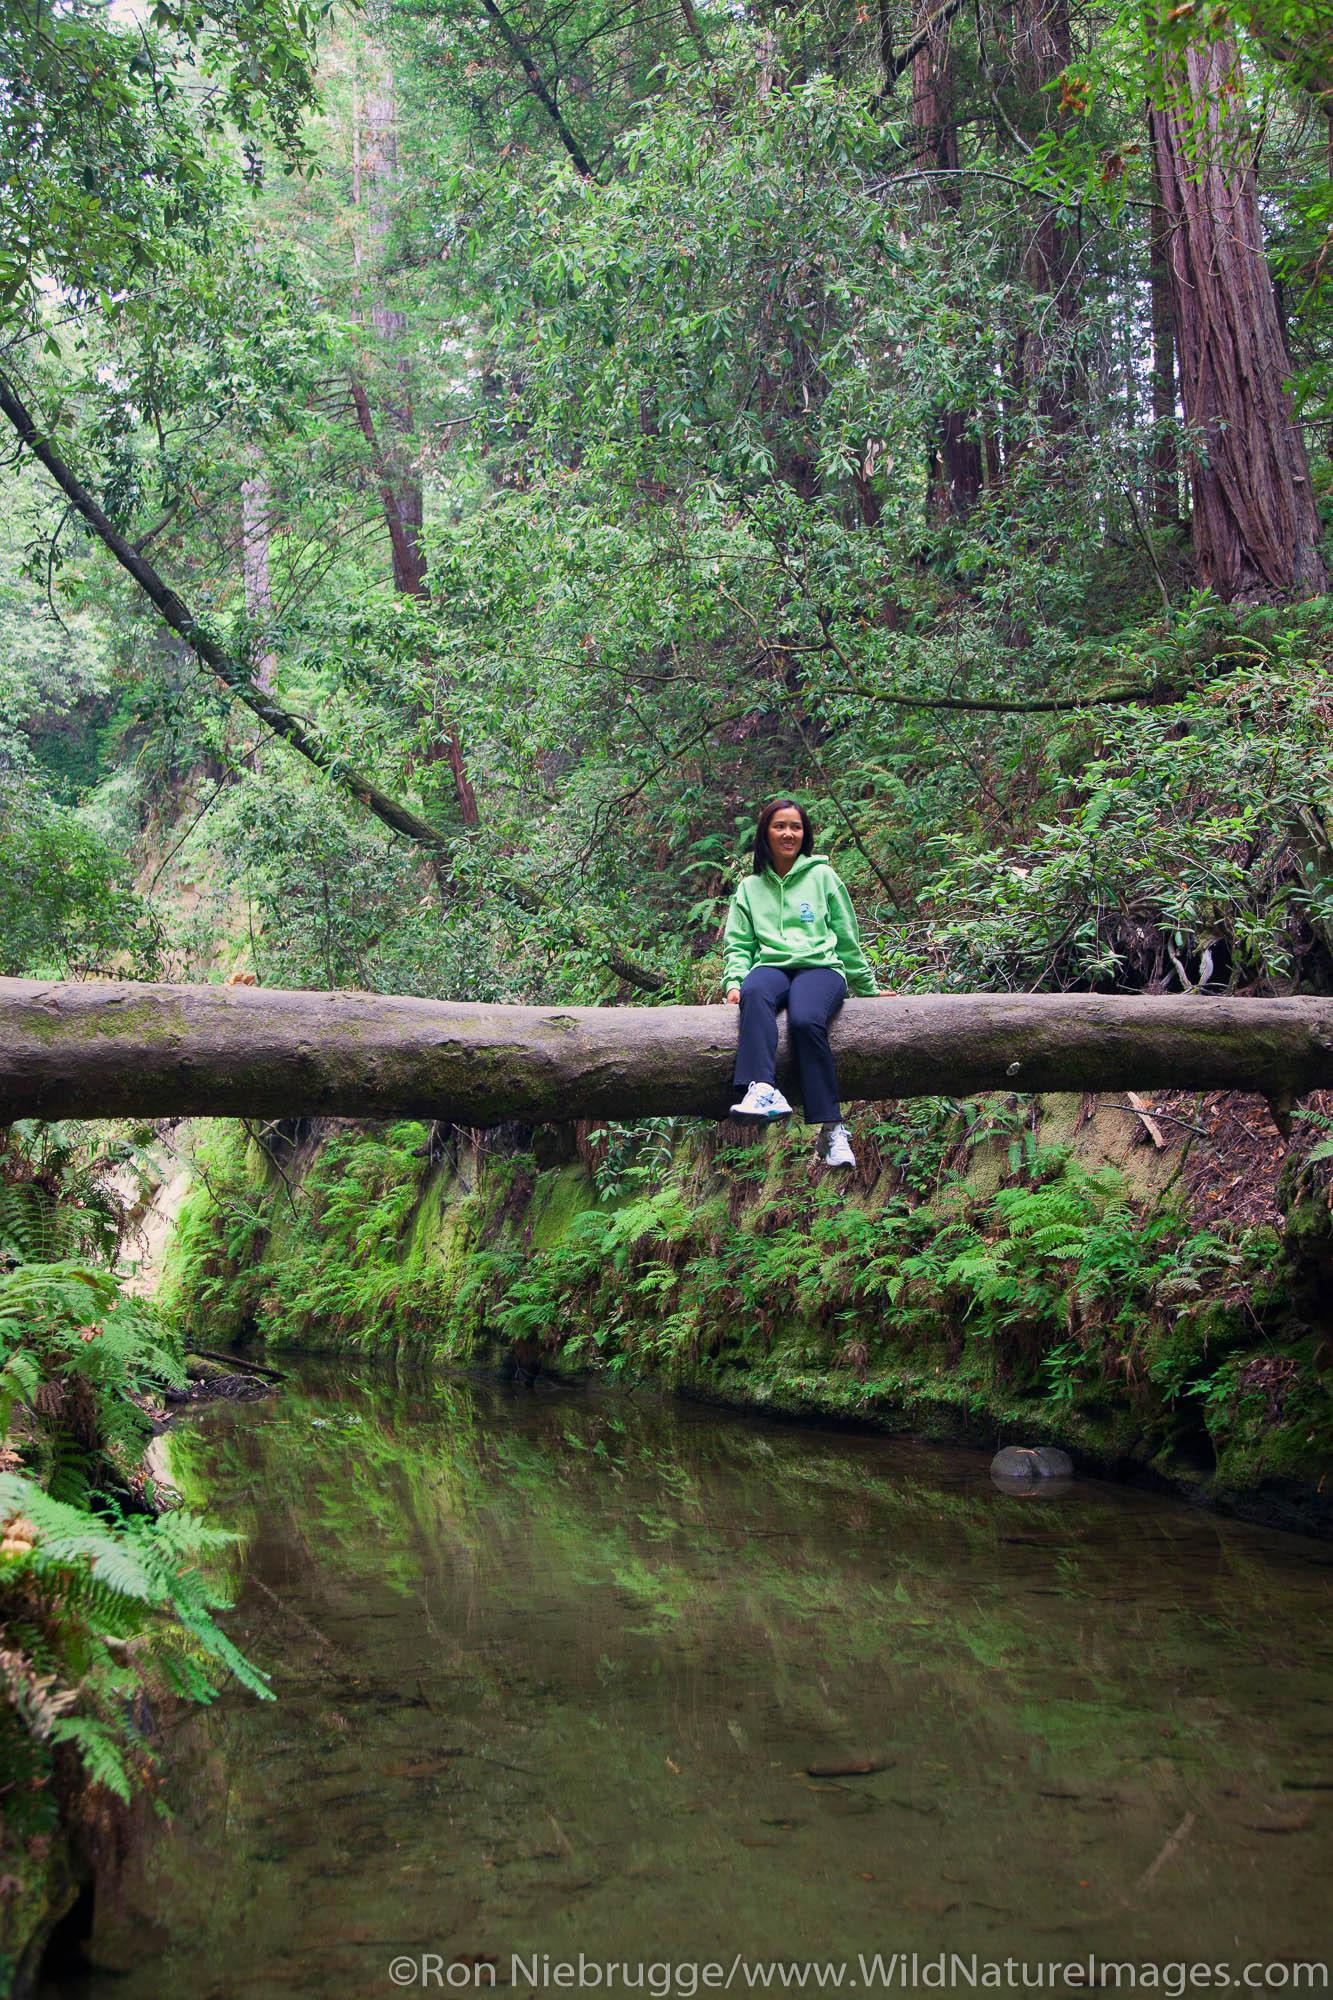 Hiking in The Forest of Nisene Marks State Park, Aptos, California.  (Model Released)